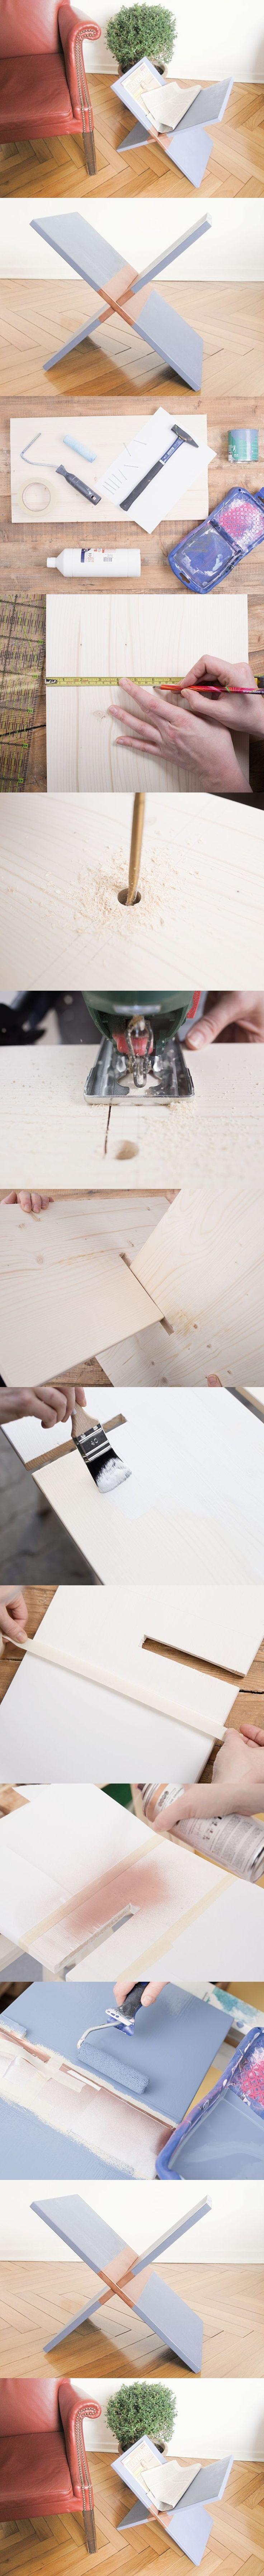 Revistero de madera minimalista - Muy Ingenioso